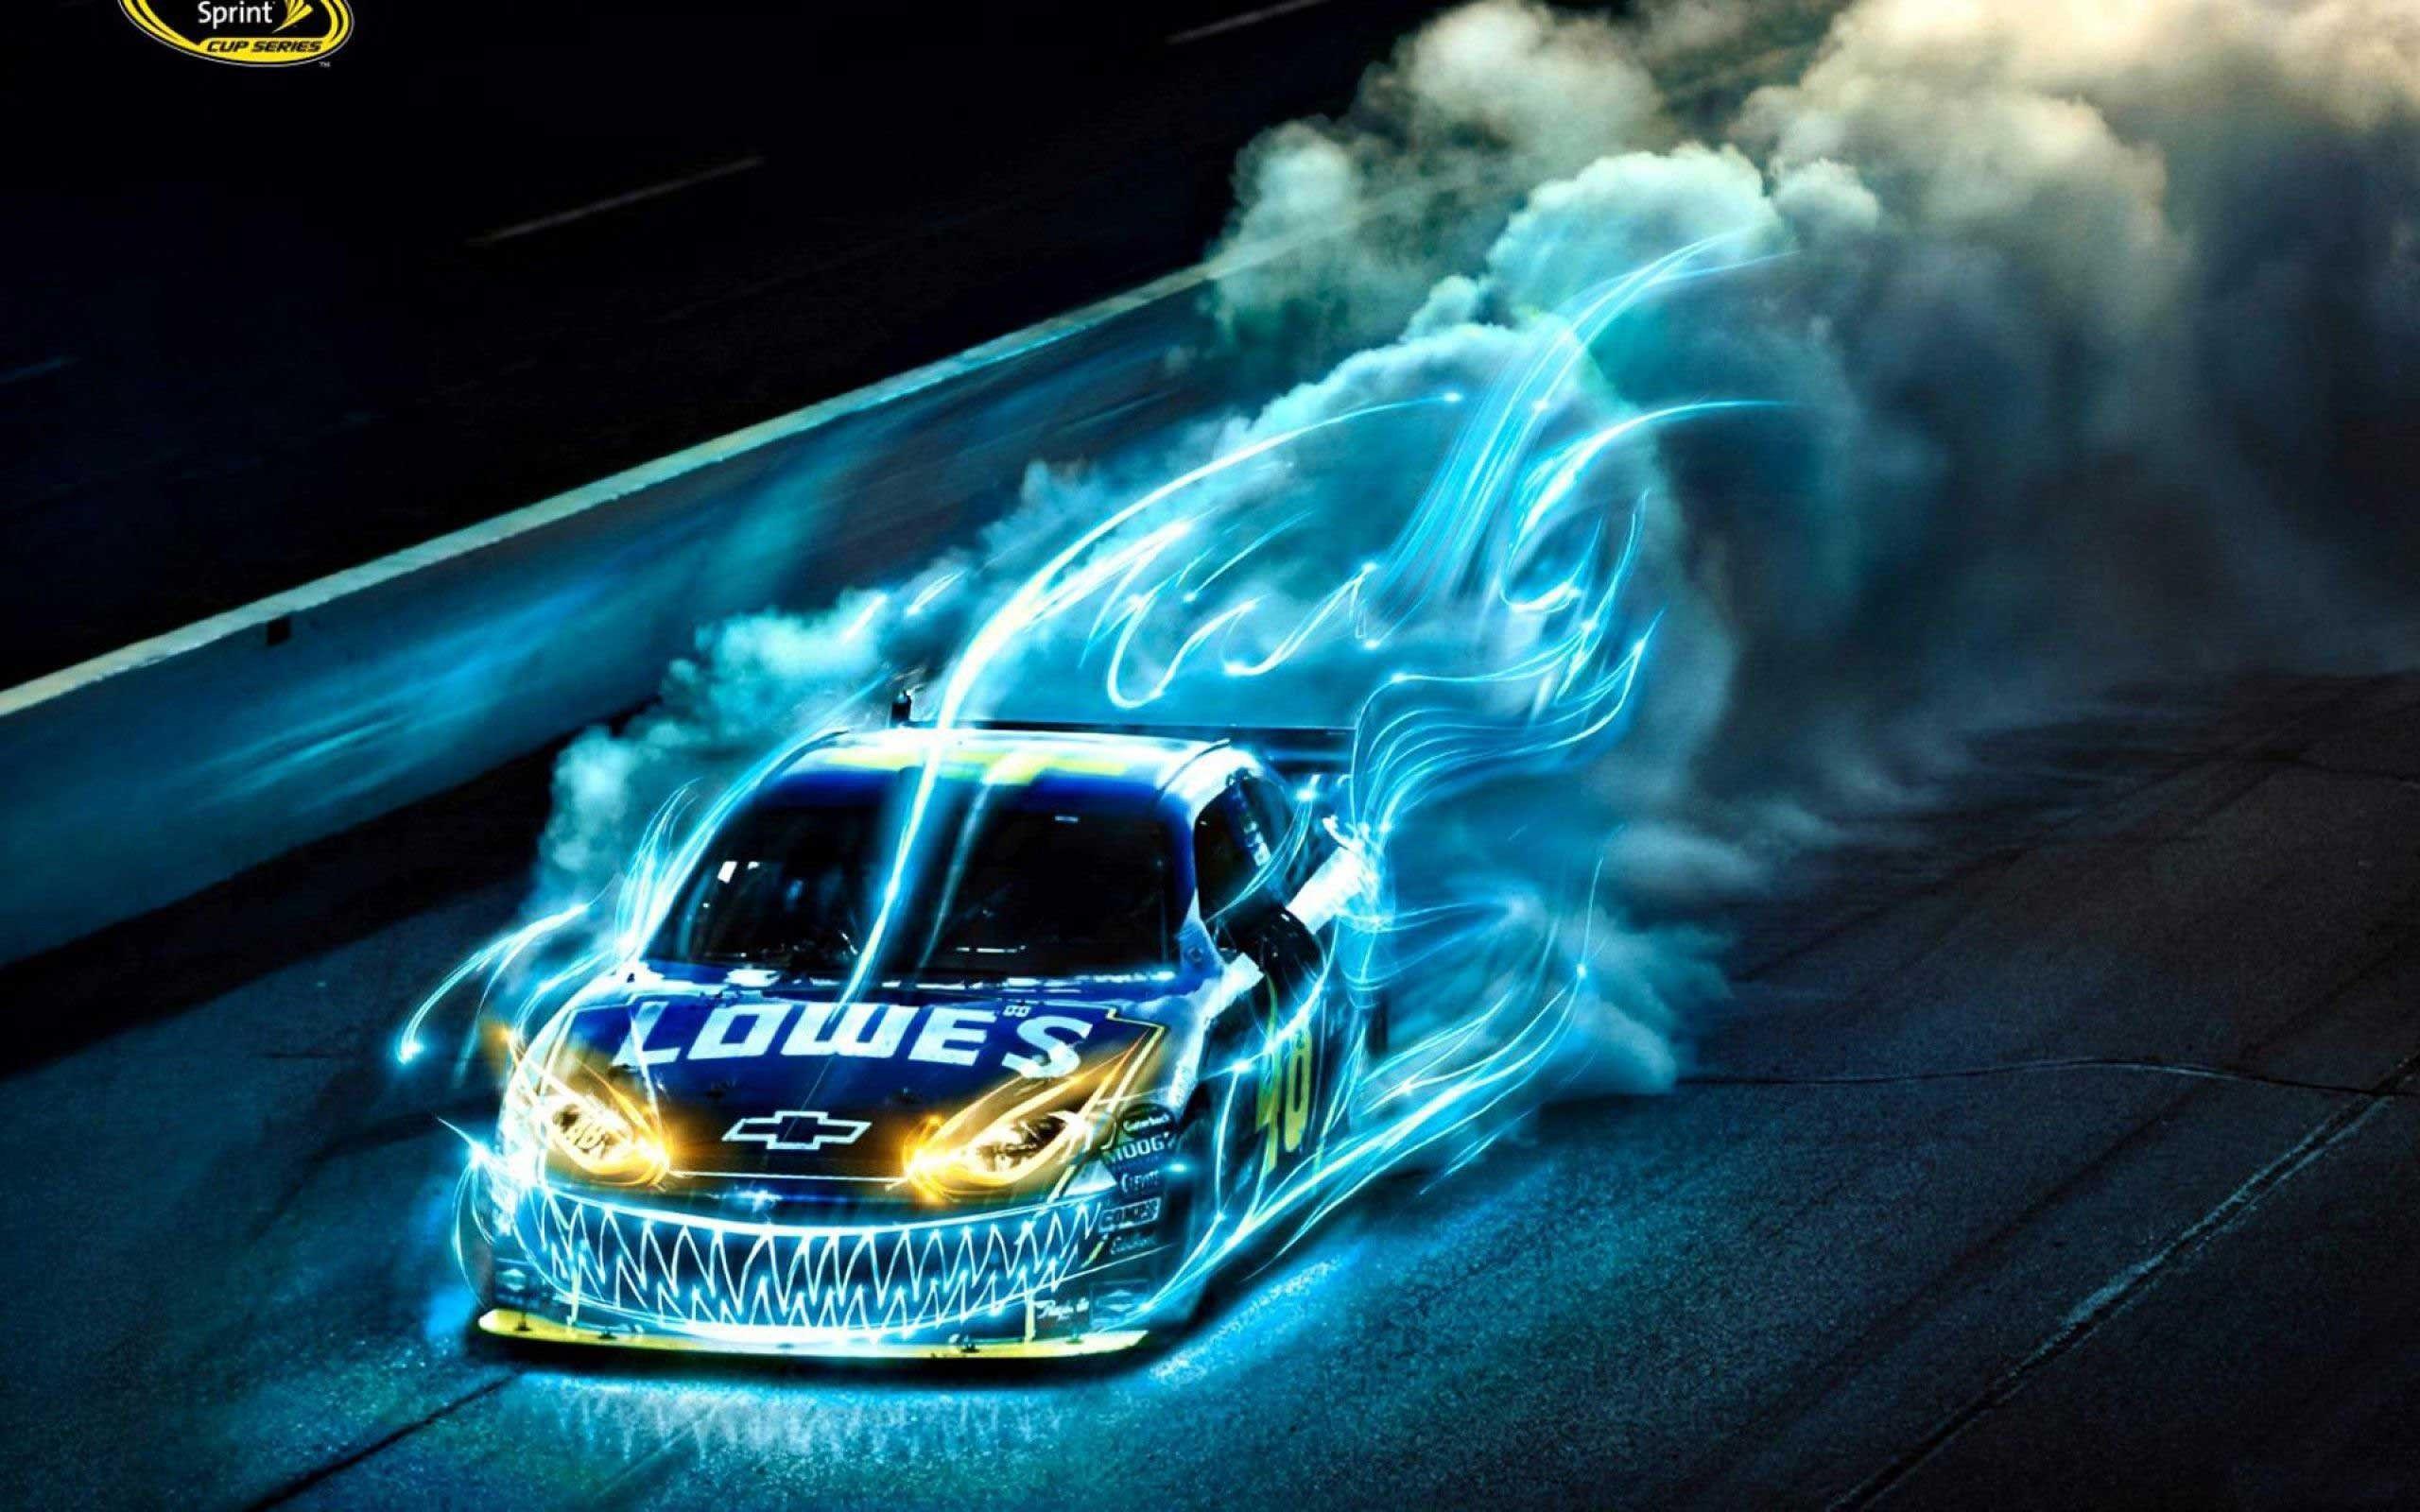 Best 3d Car Backgrounds Hd Download Nascar Car Wallpapers Racing